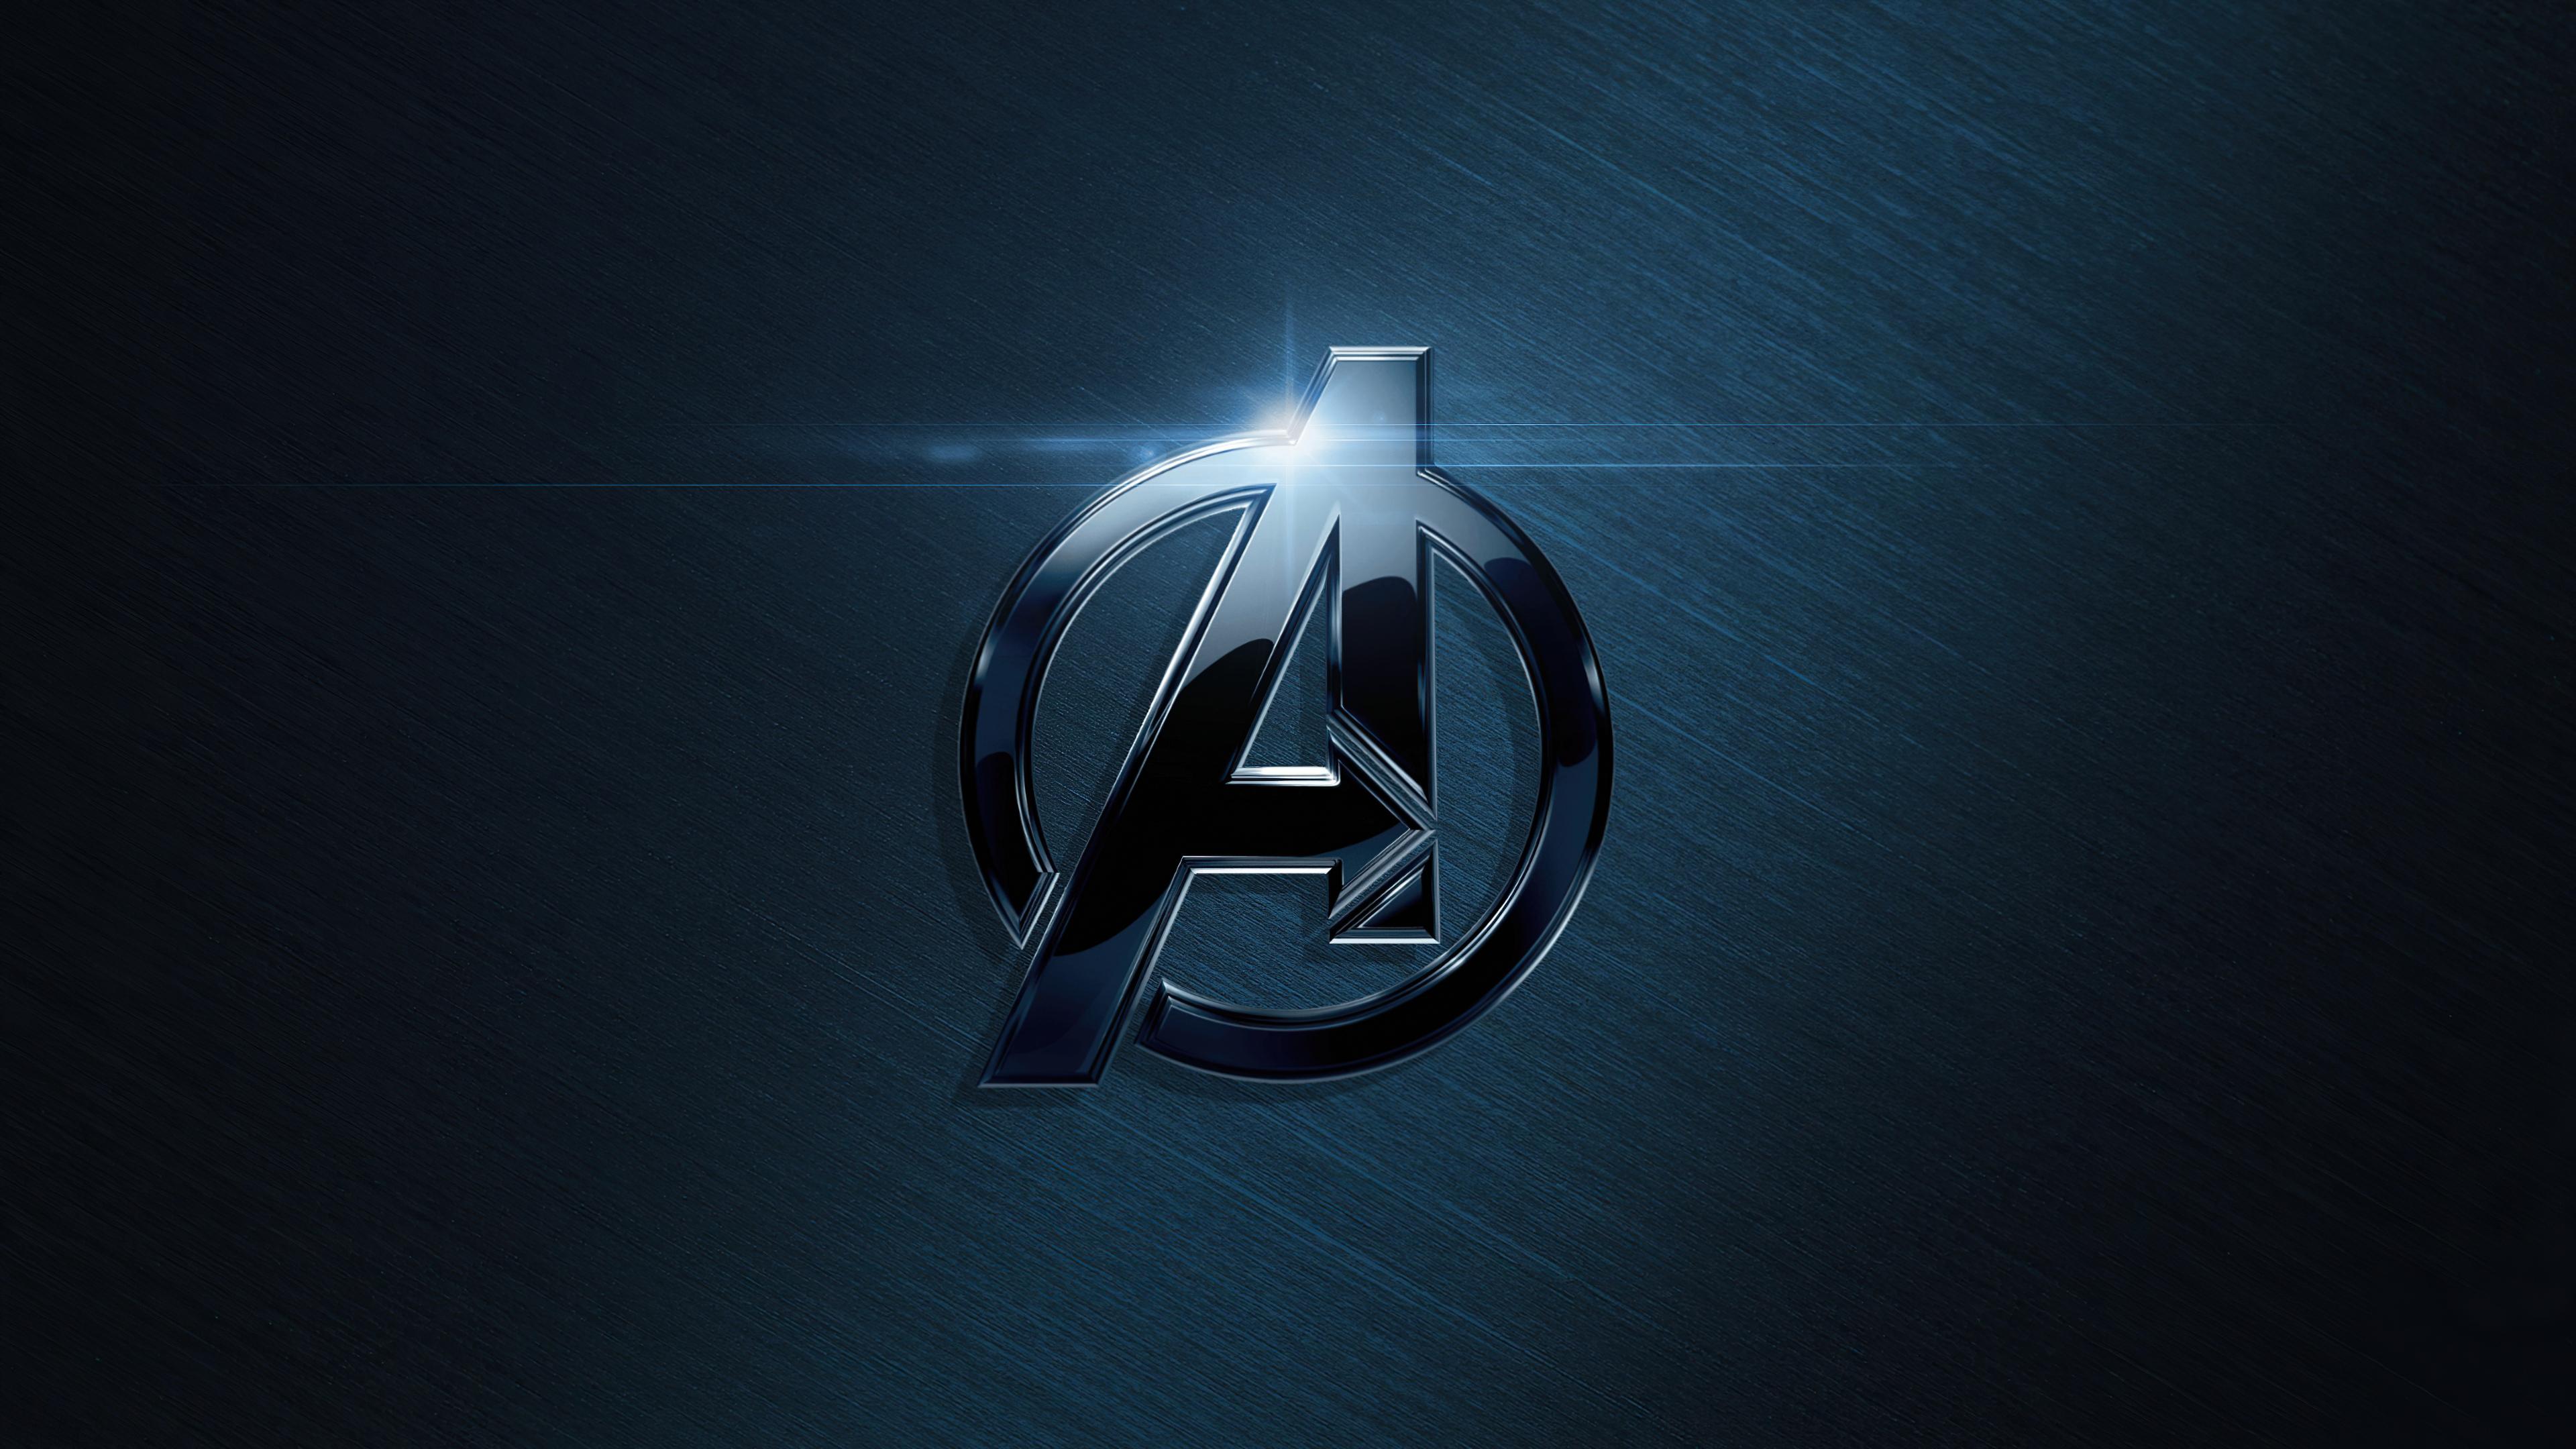 the avengers metal logo 4k 1615192363 - The Avengers Metal Logo 4k - The Avengers Metal Logo 4k wallpapers